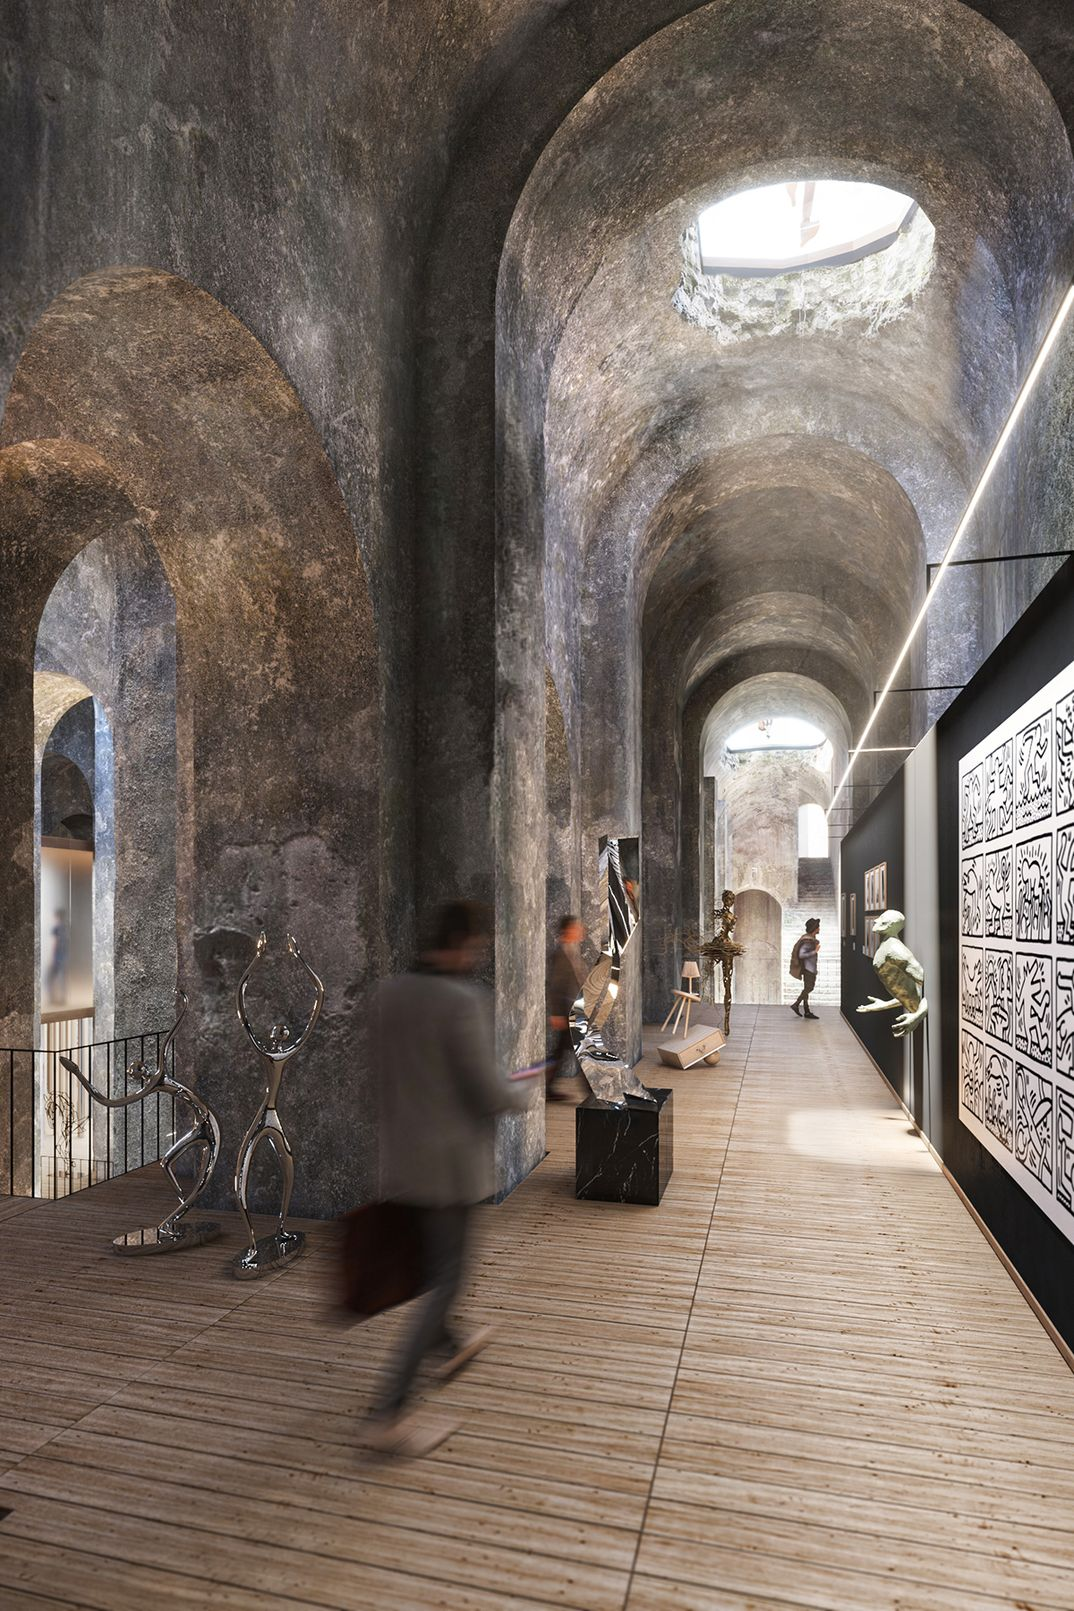 Re-Use Roman Ruin - Piscina Mirabilis